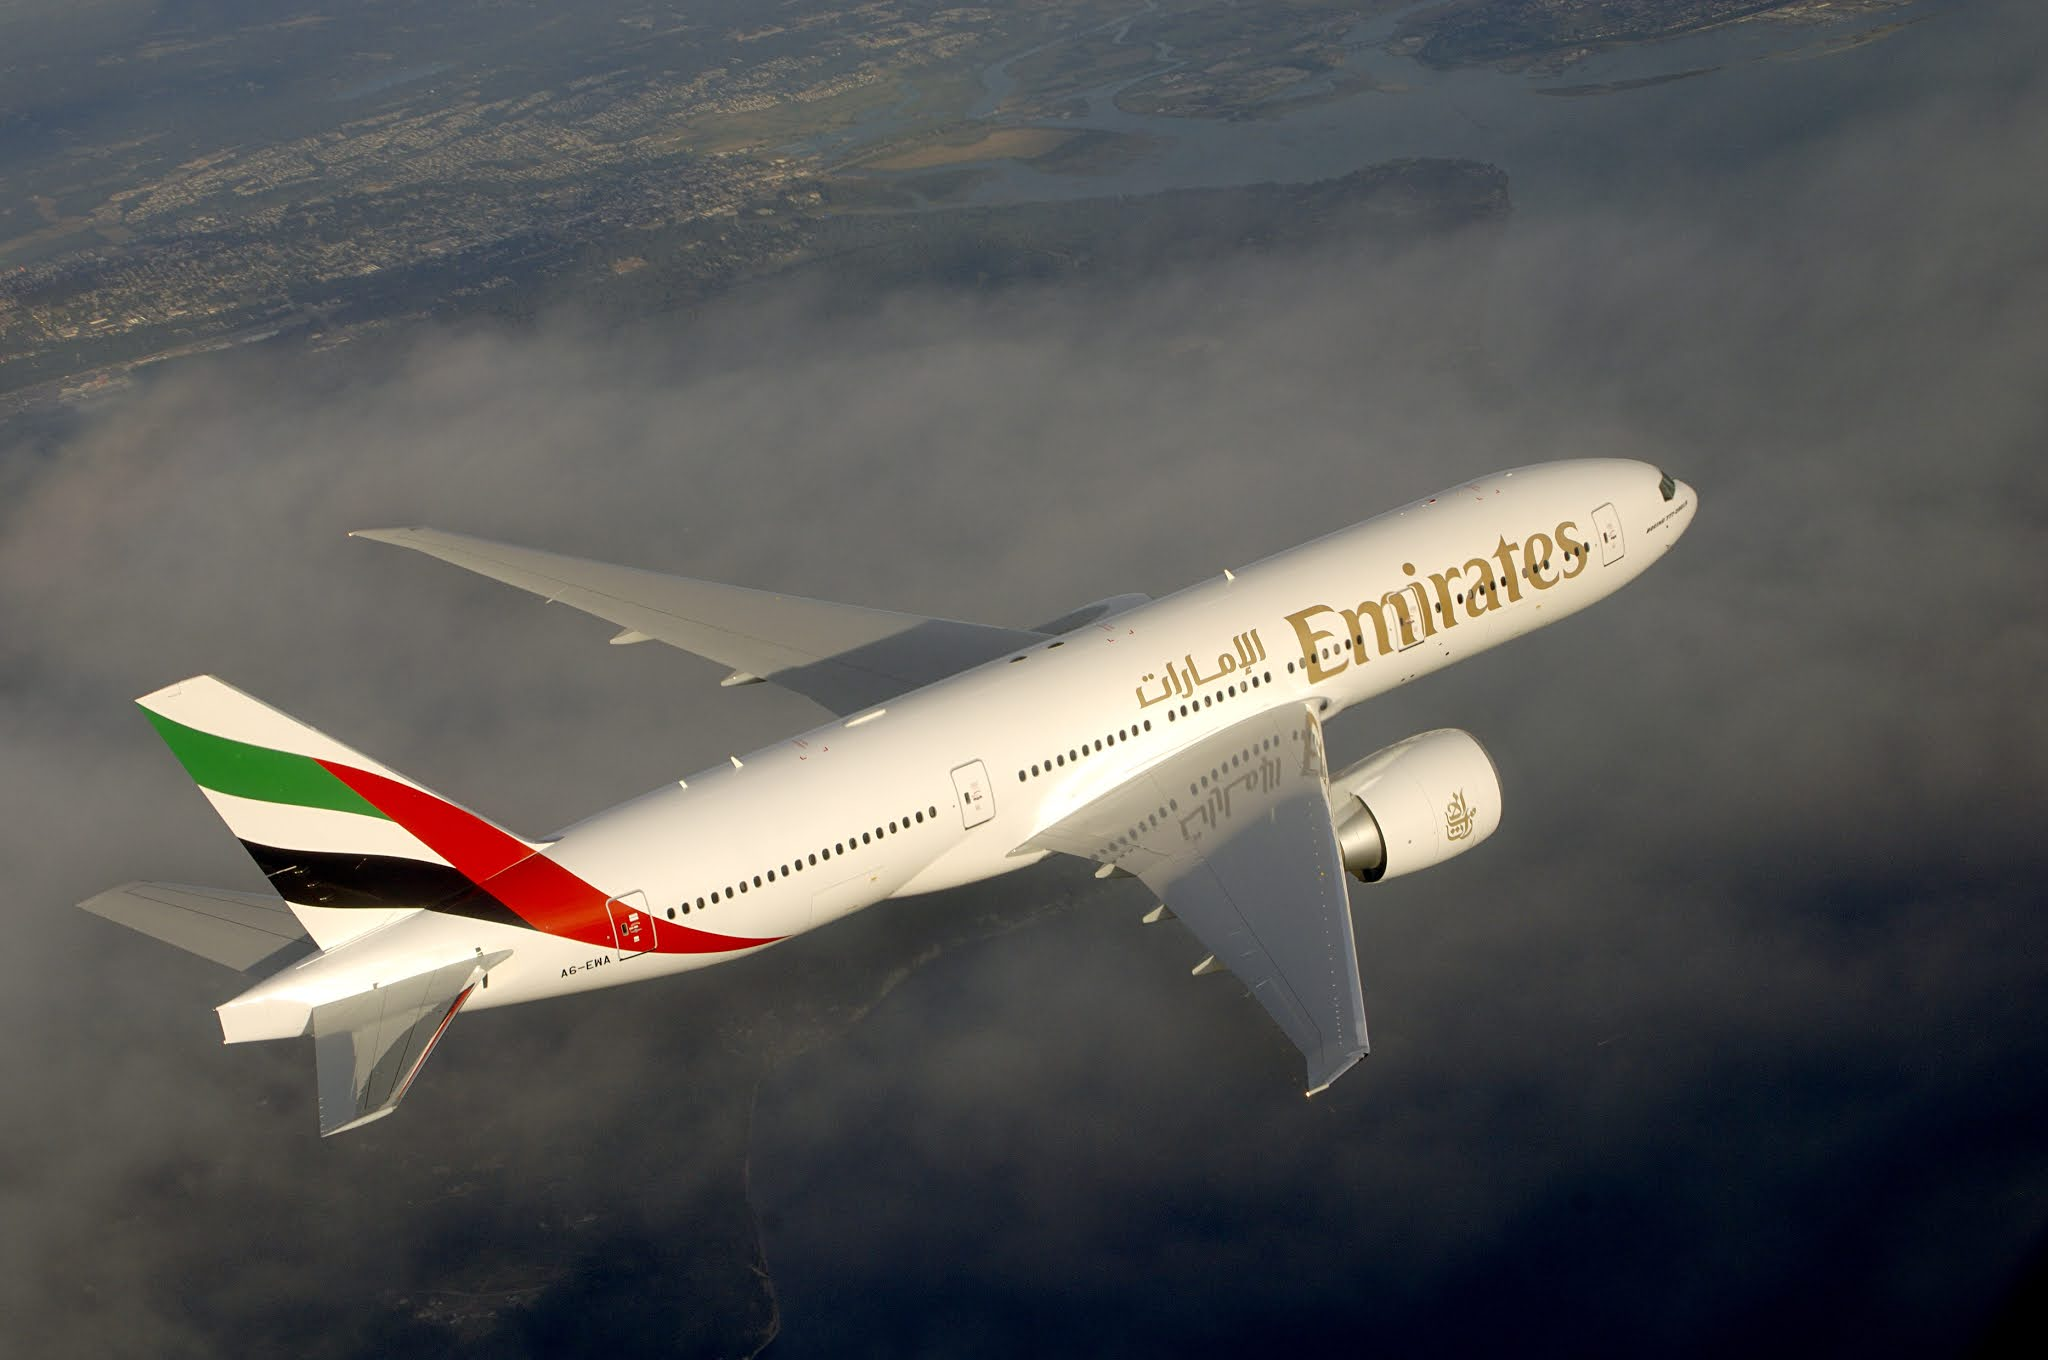 Emirates summer fares to popular destinations